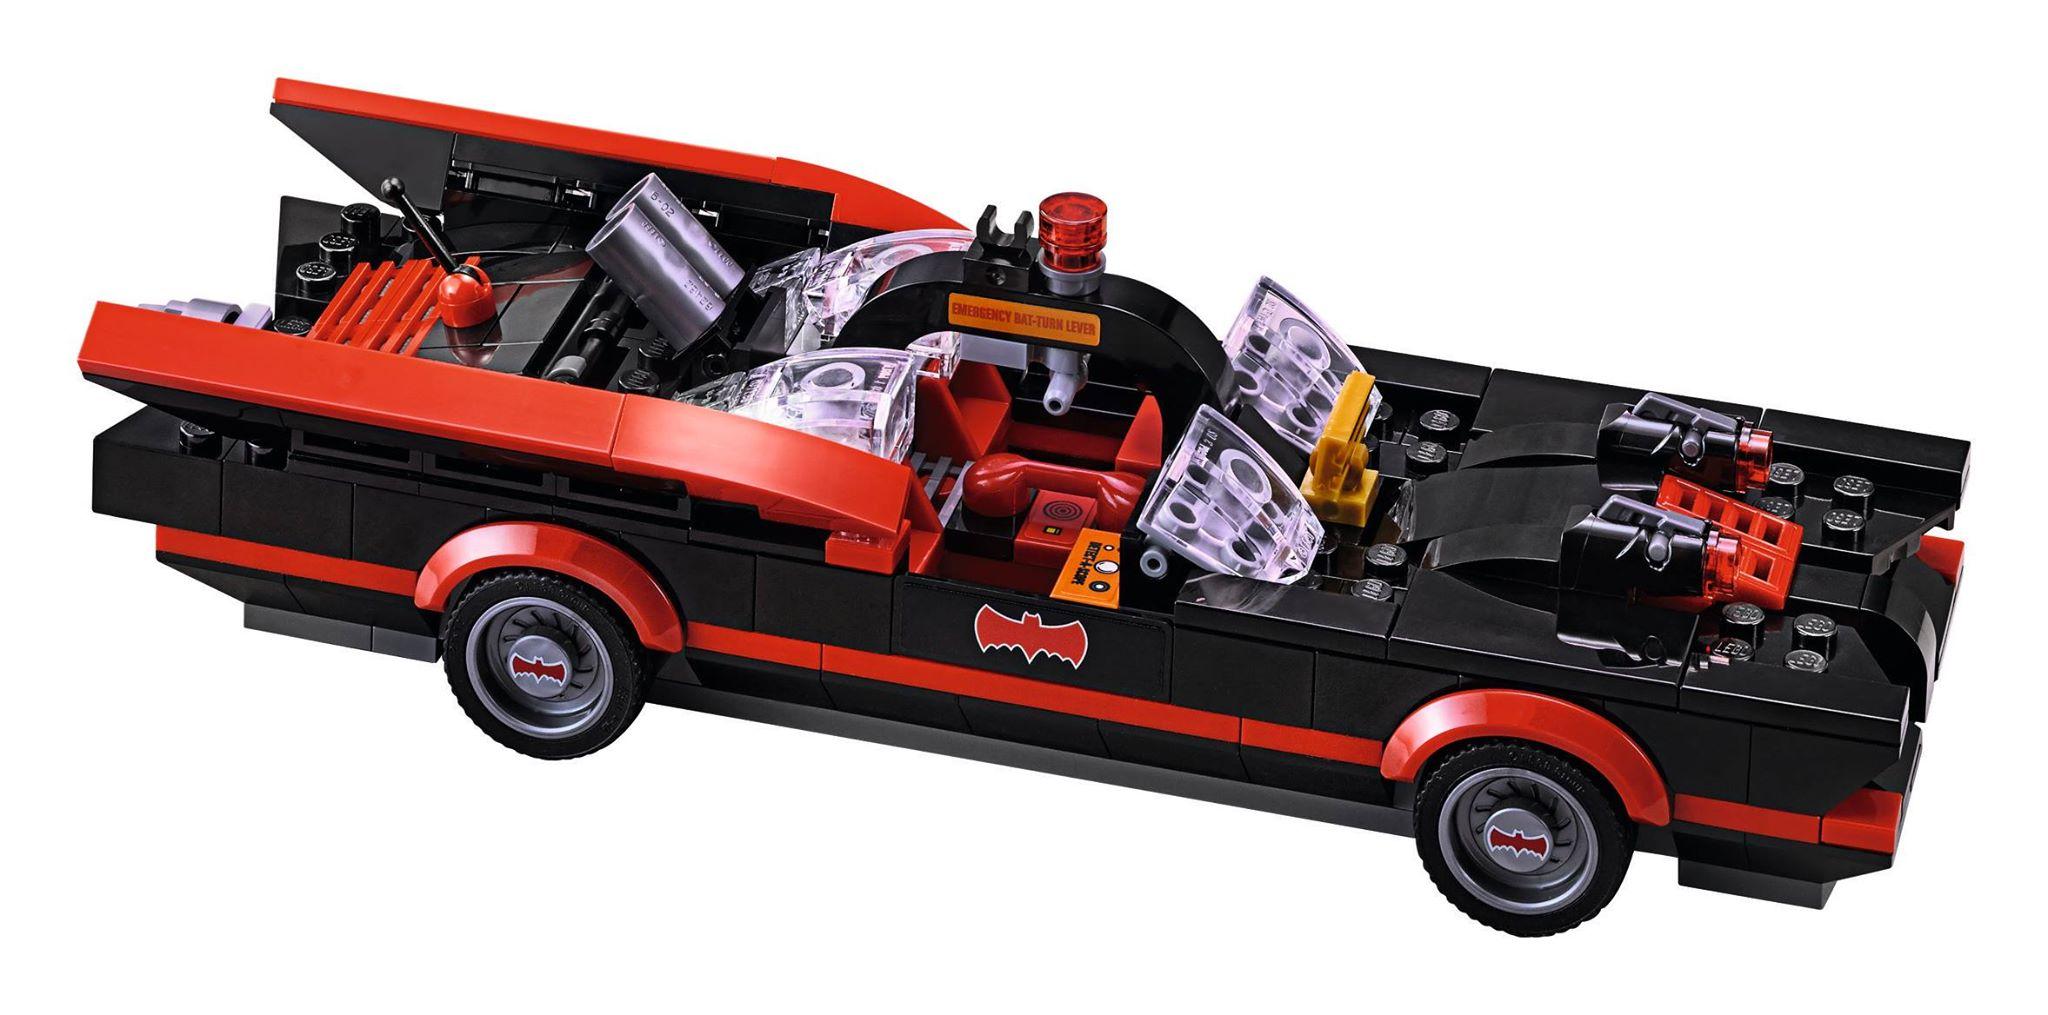 76052 Bat Mobile